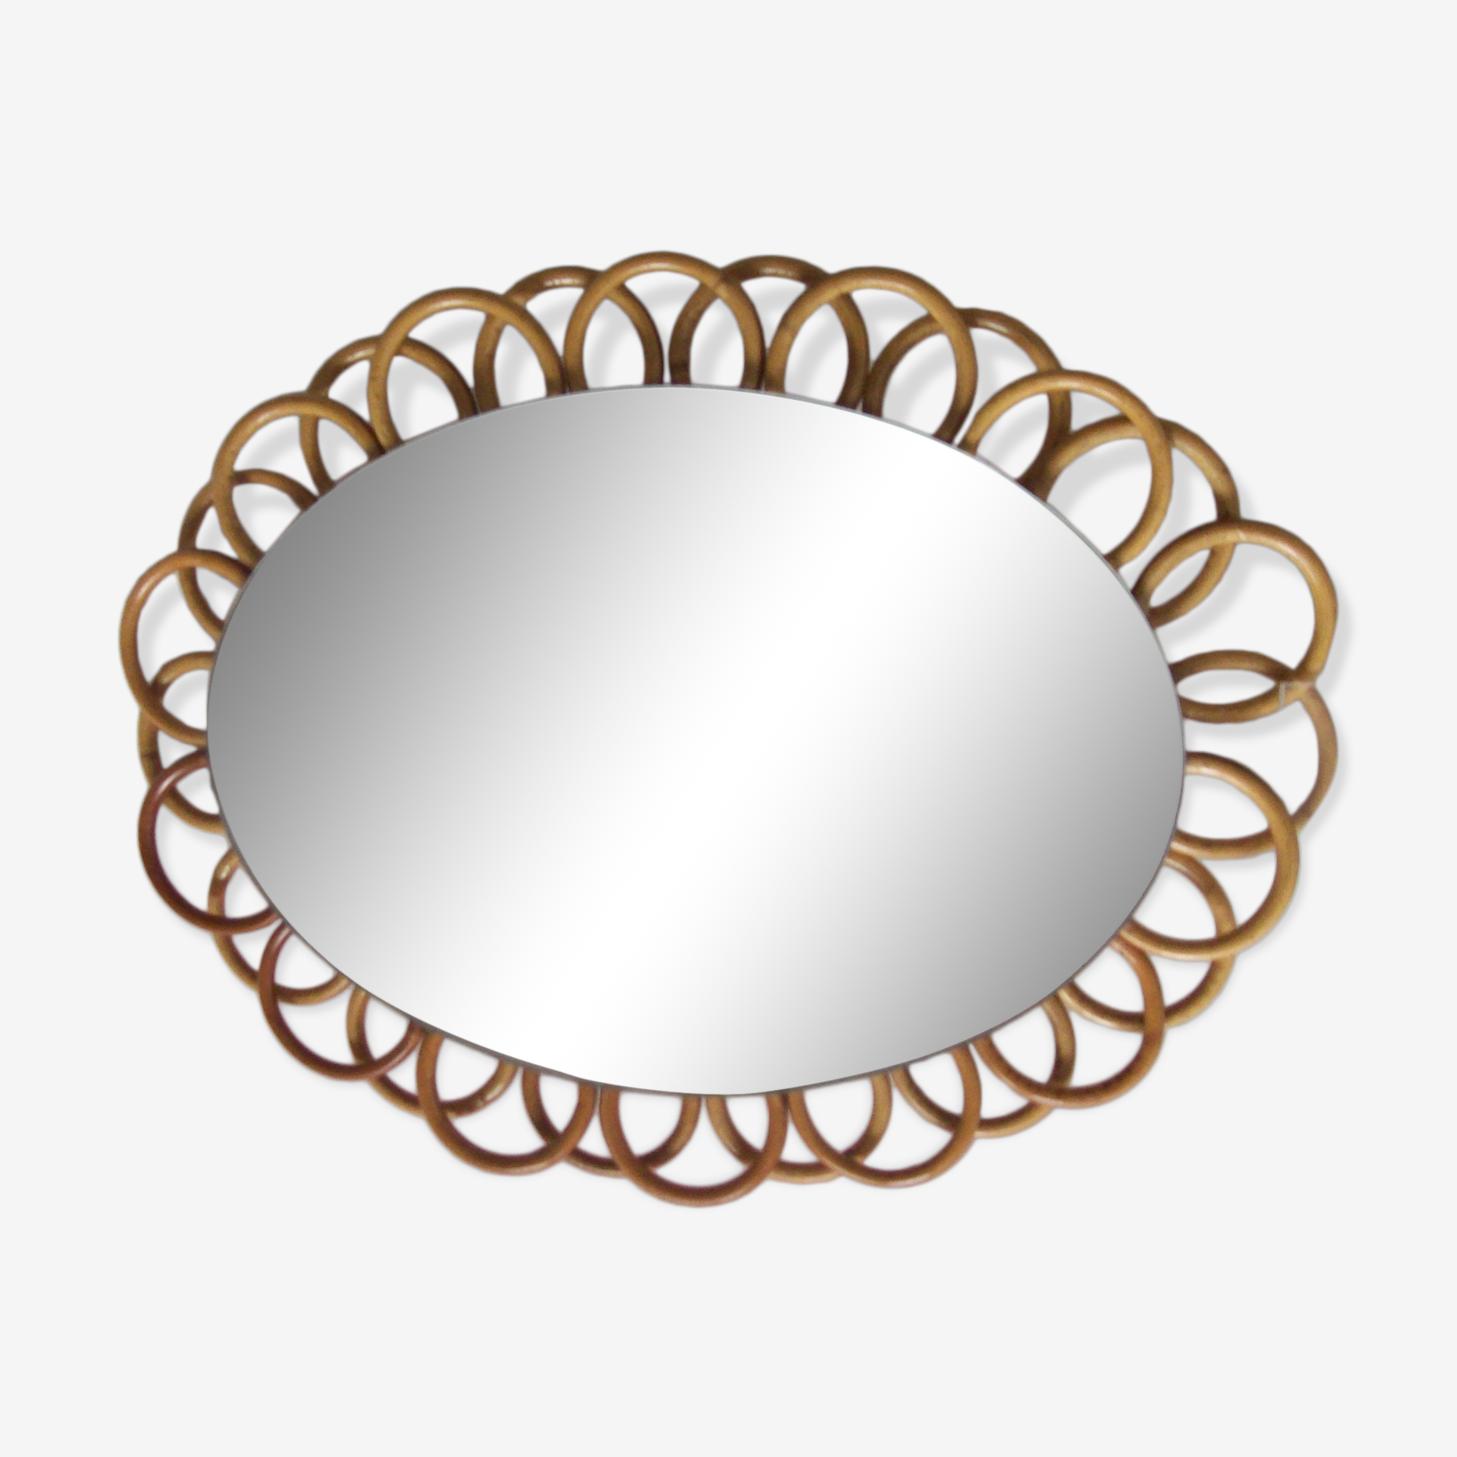 Vintage rattan mirror, 28x36cm